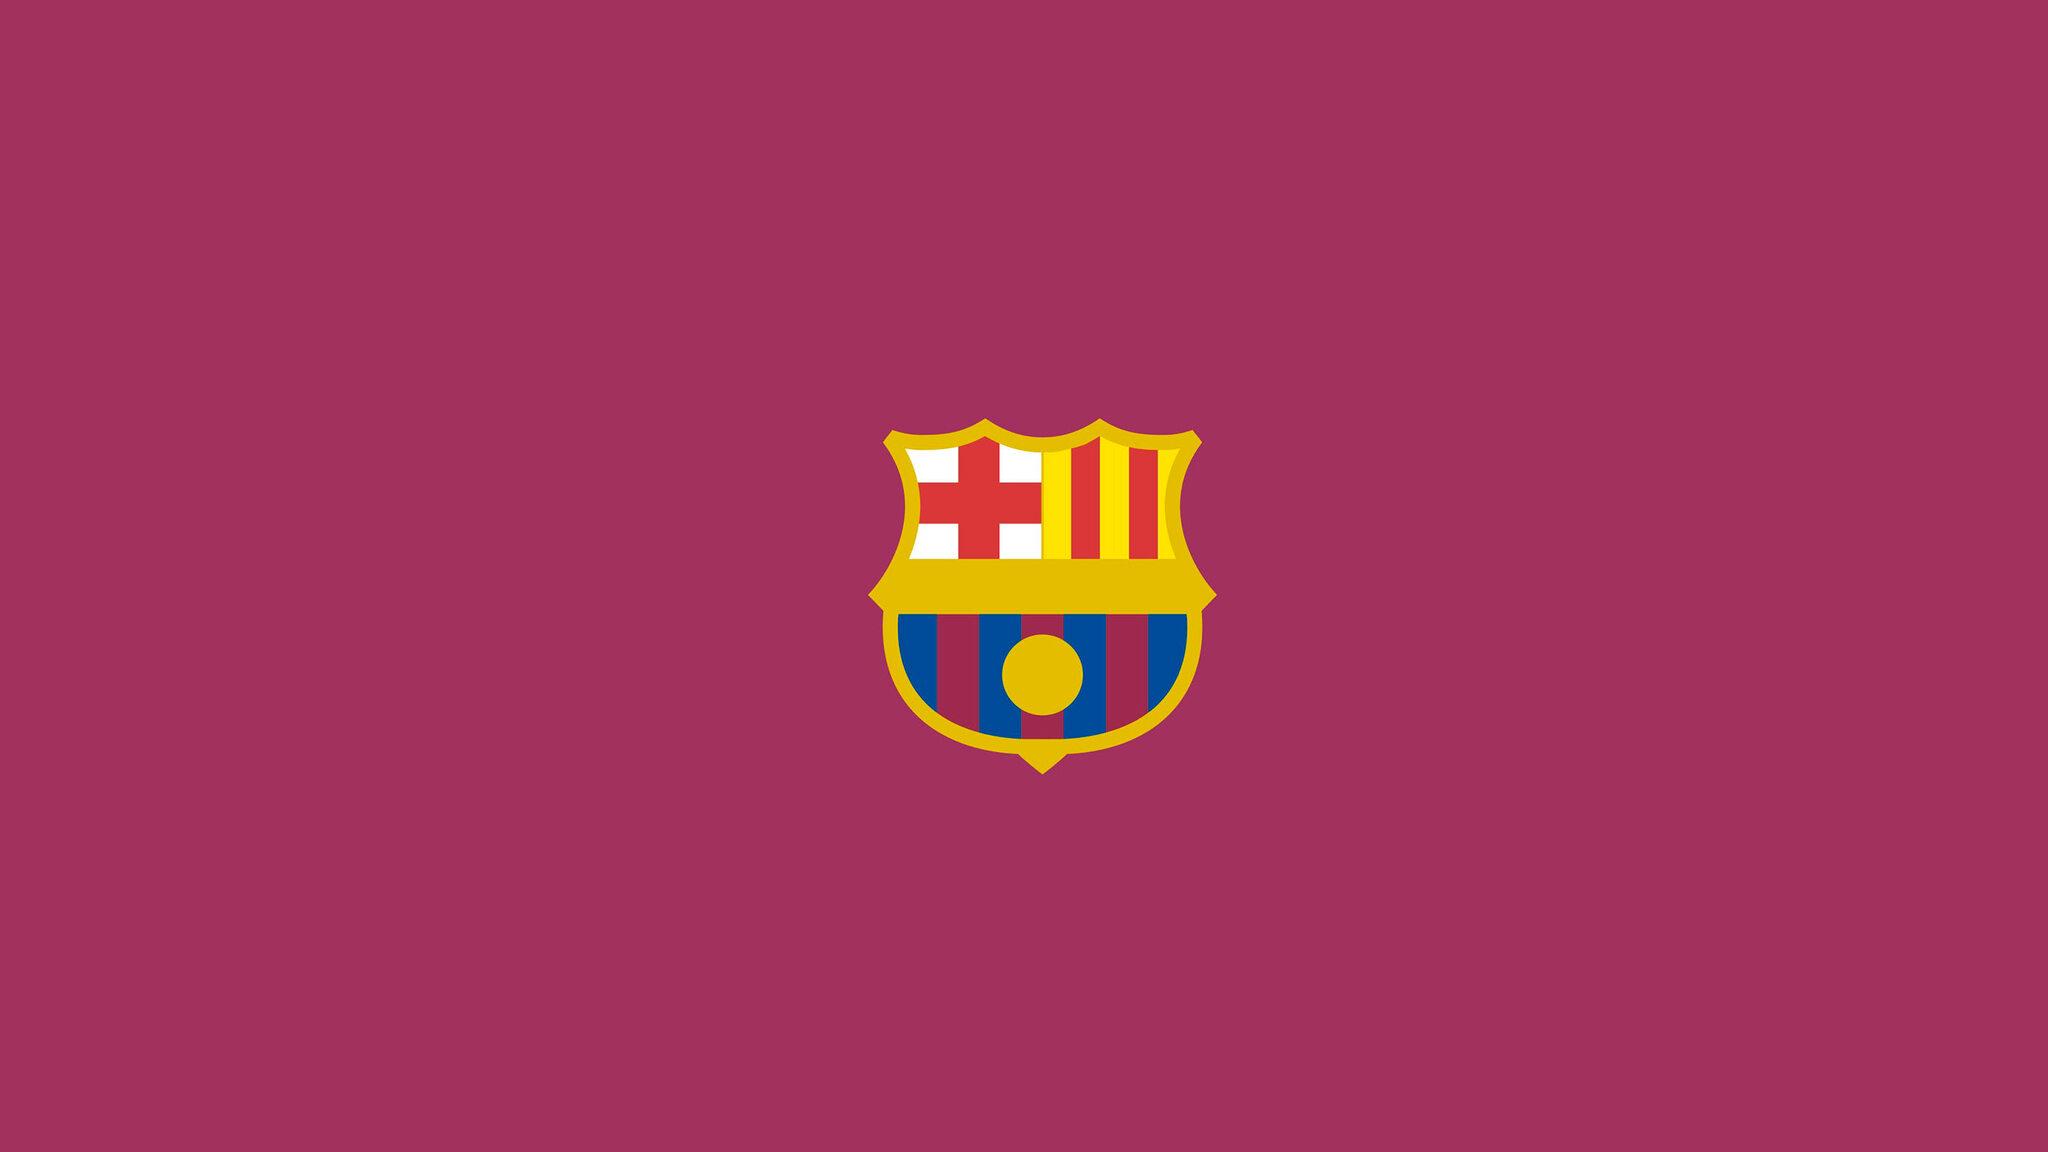 2048x1152 FC Barcelona Logo Minimalism 2048x1152 Resolution